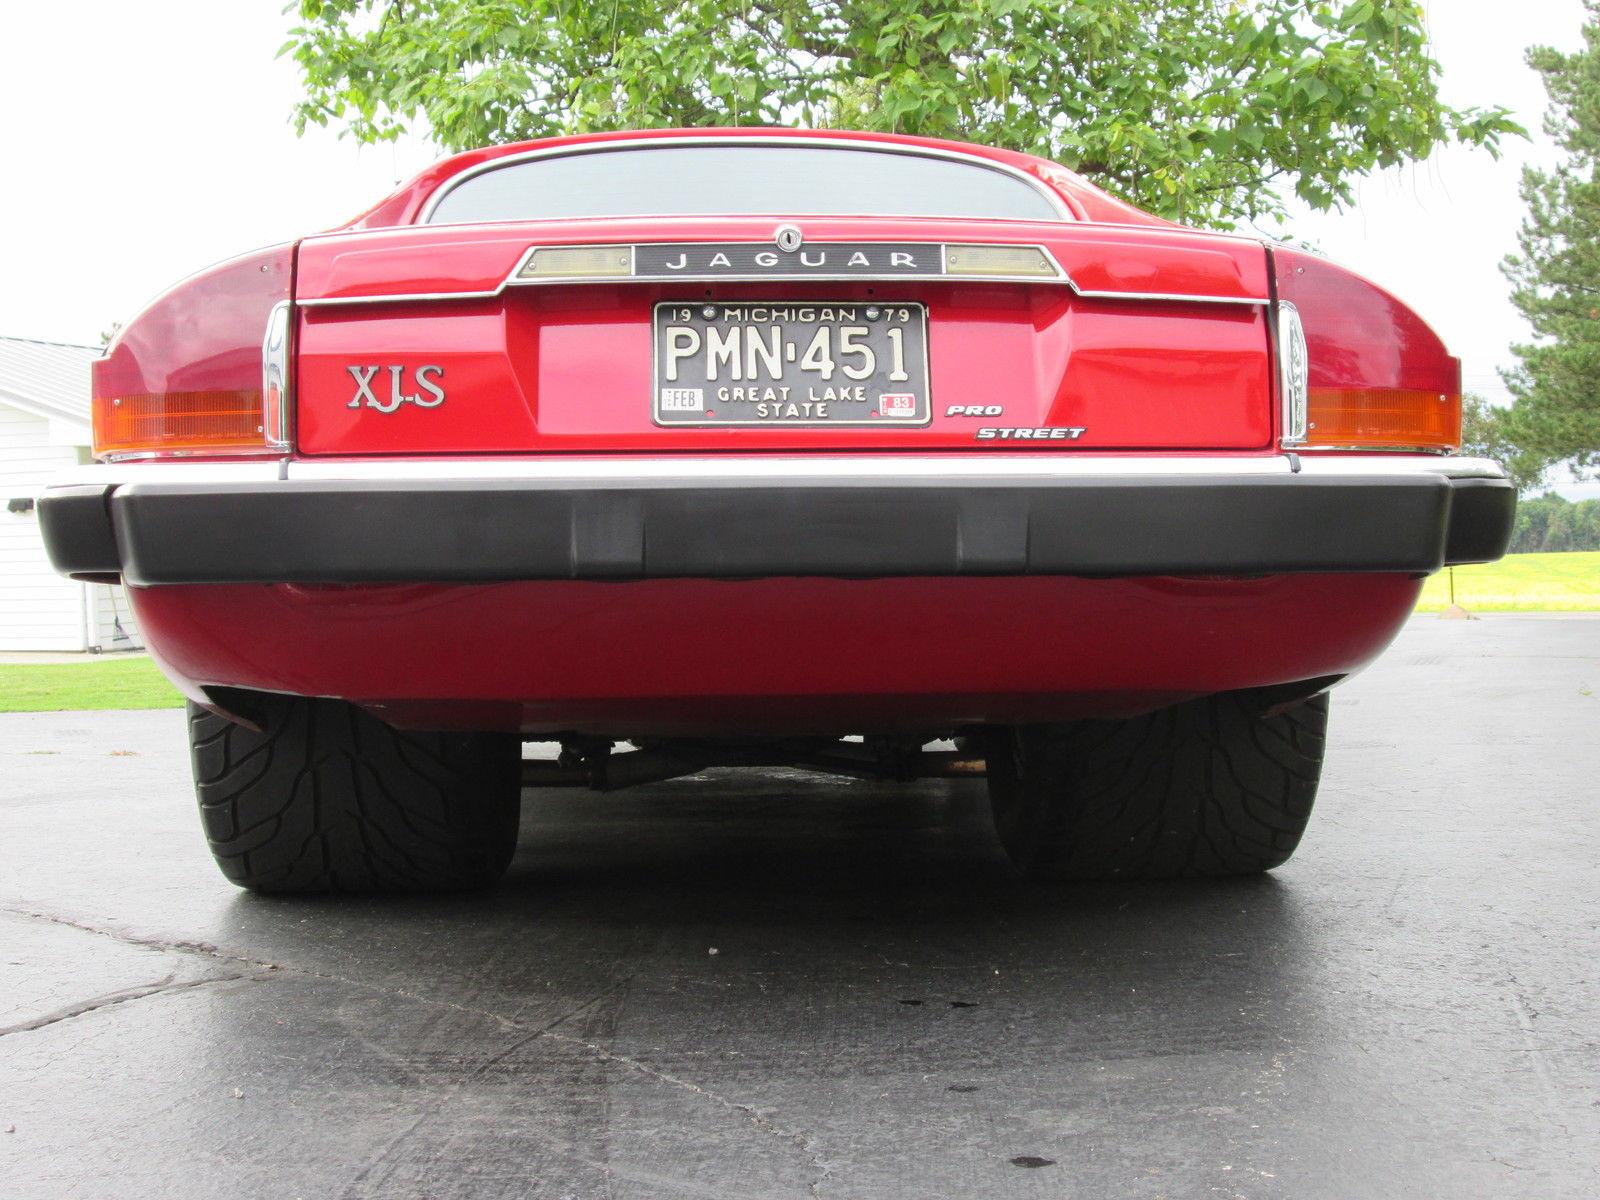 Pro Street Jaguar Xjs Is Street Legal Powered By Blown Chevrolet V8